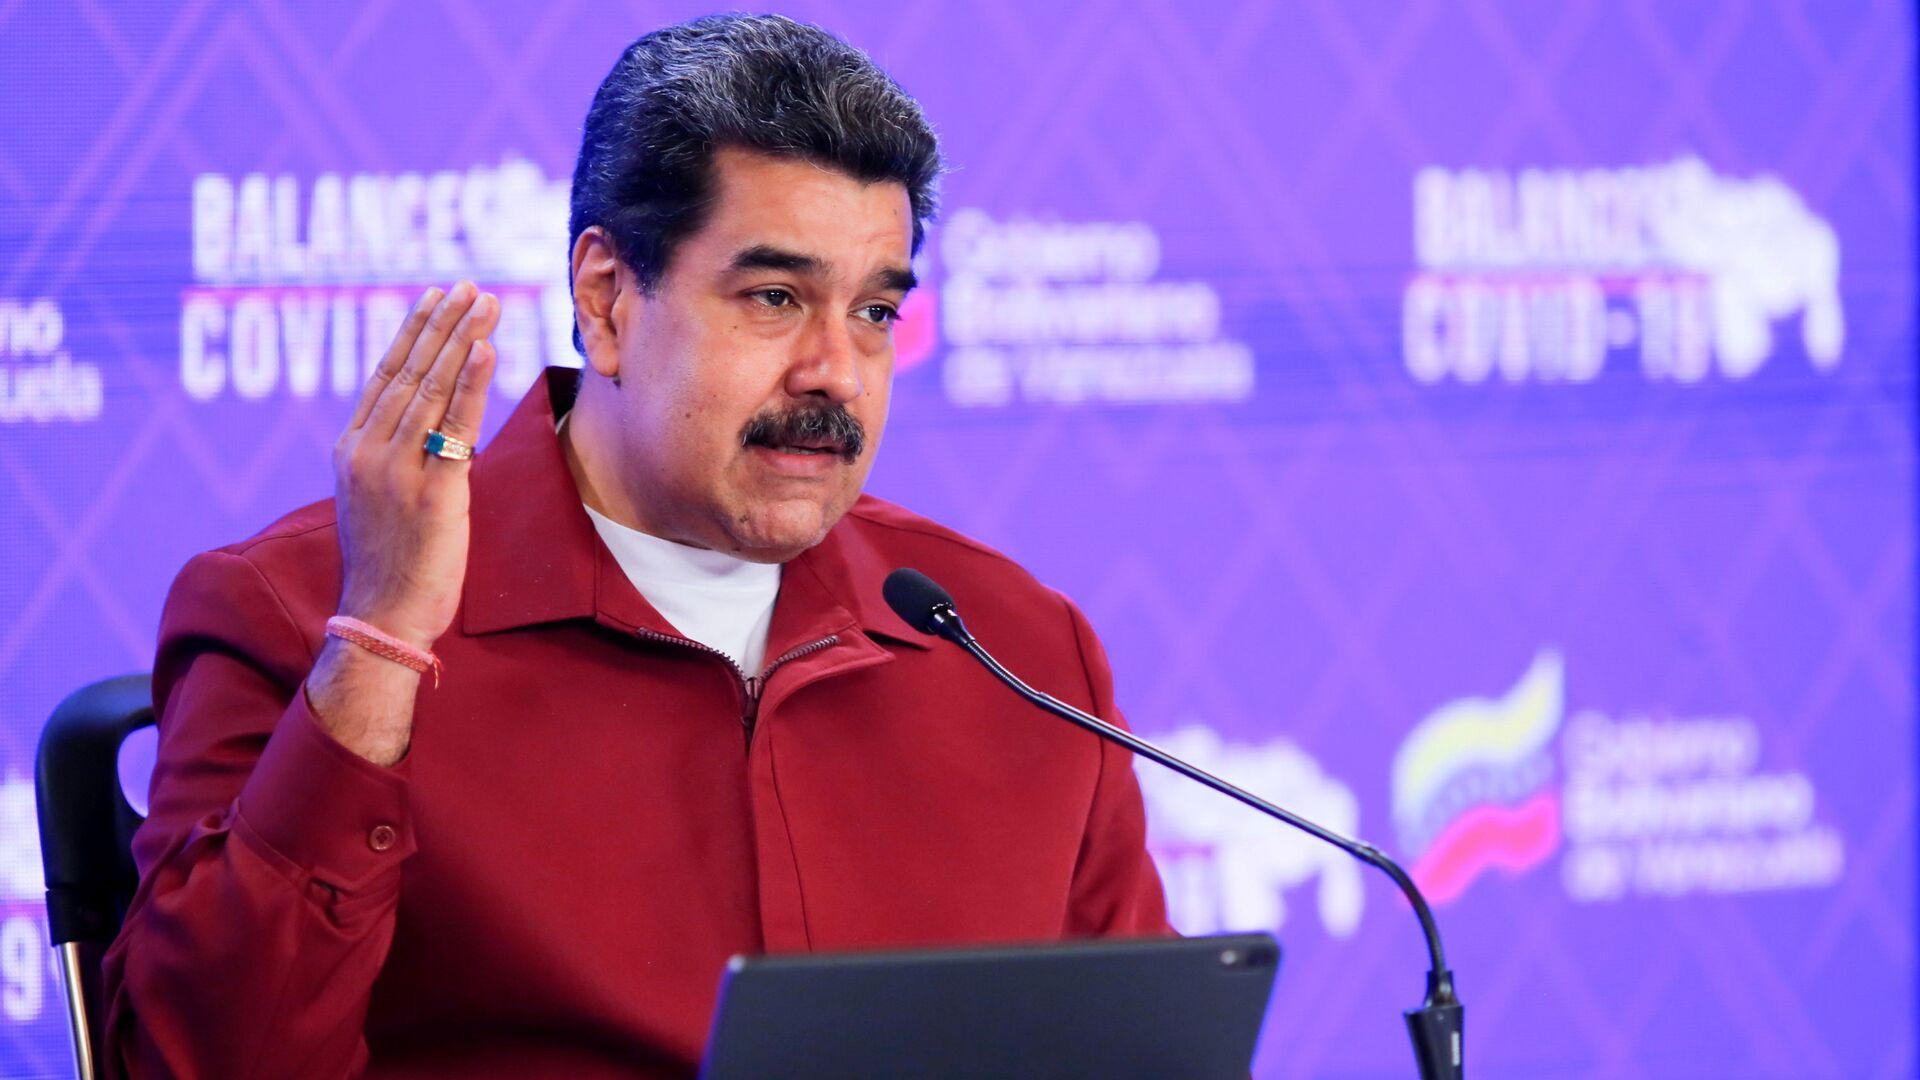 Venezuela's President Nicolas Maduro gives a speech in Caracas, Venezuela March 3, 2021. - Sputnik Italia, 1920, 14.08.2021